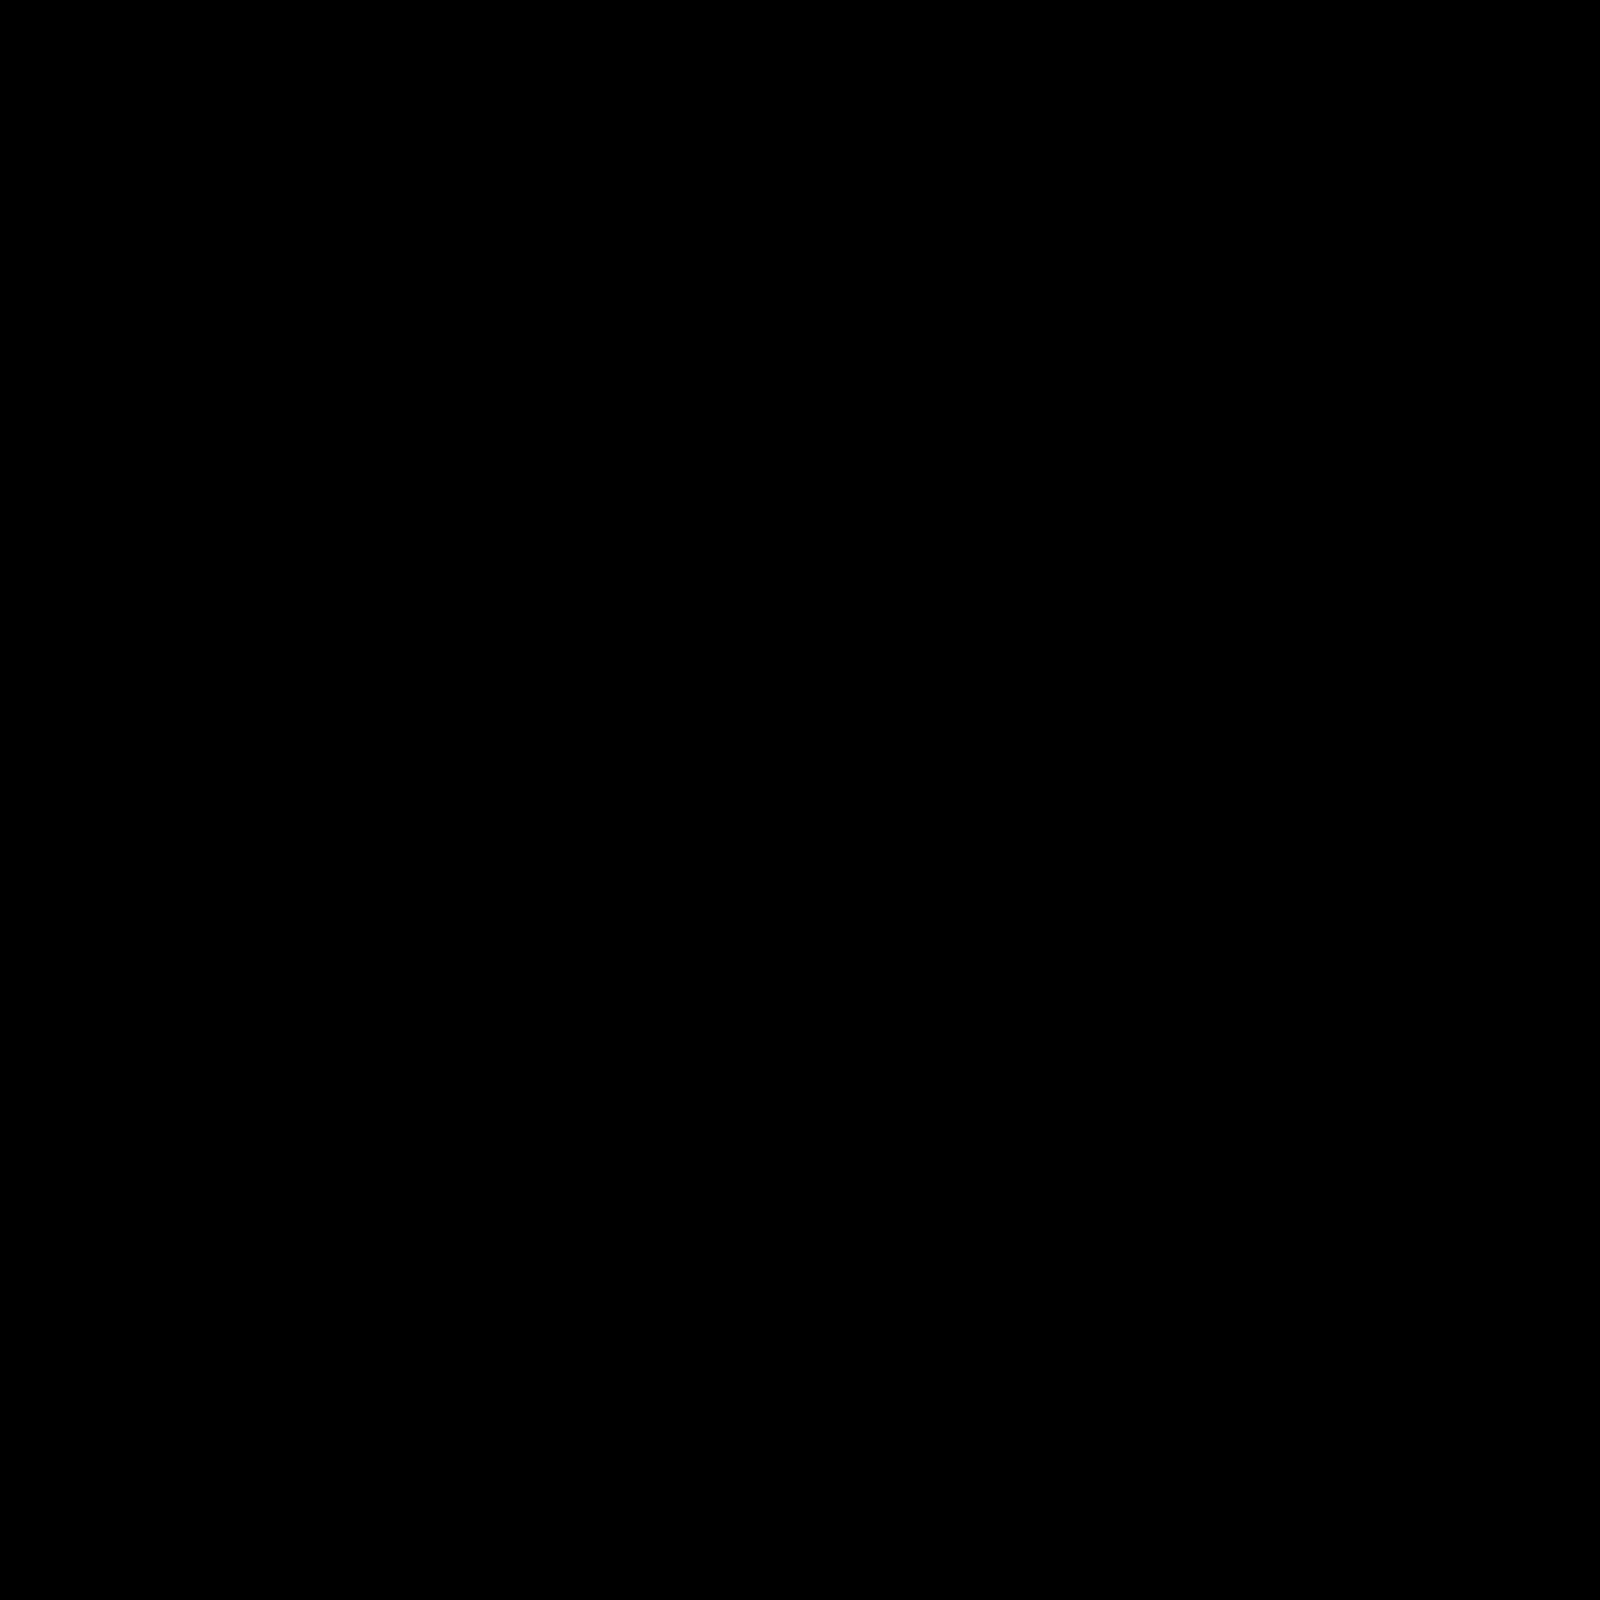 Shared Mailbox icon